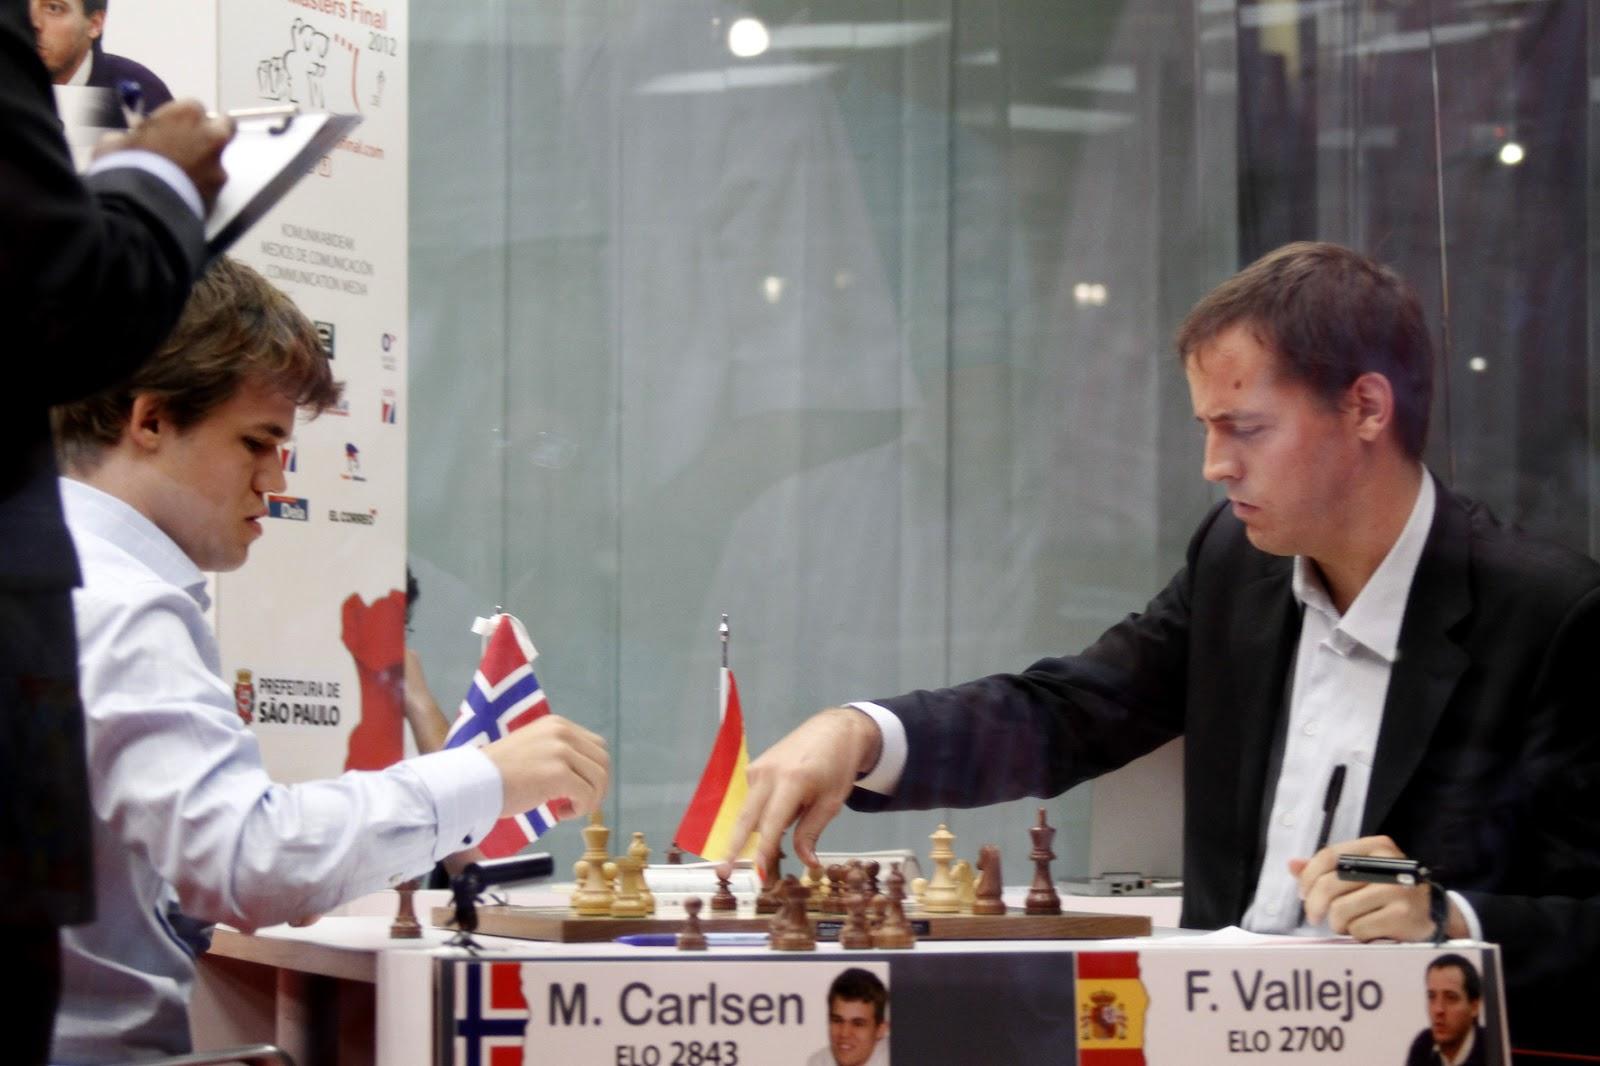 Aronian chess masters bilbao 2012